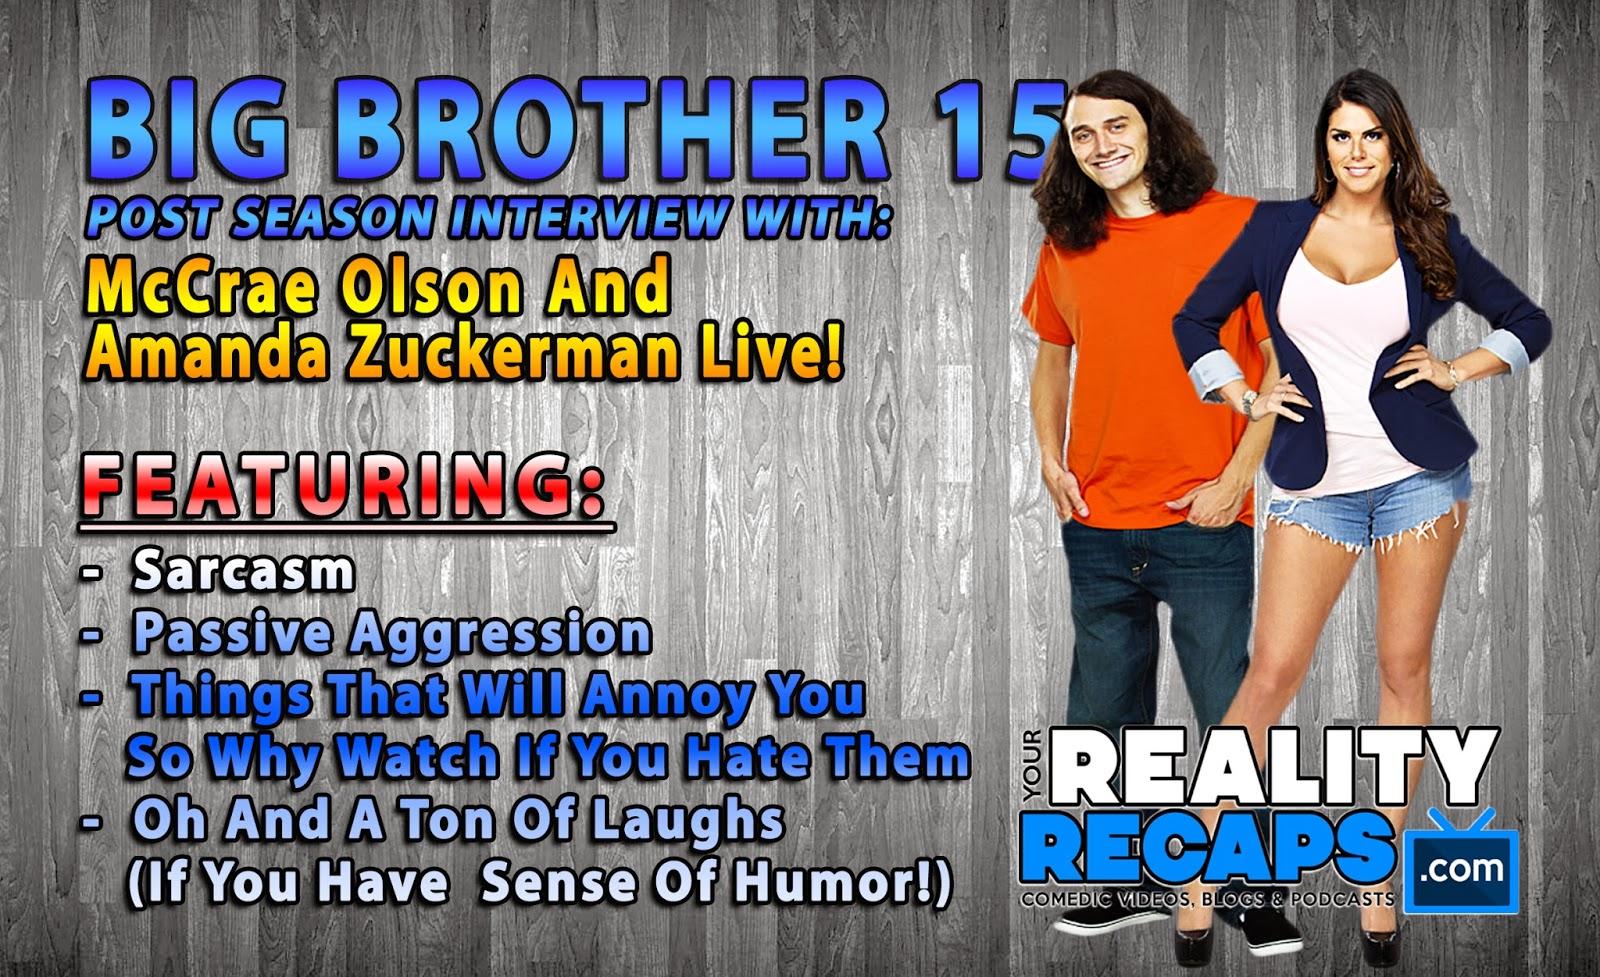 Your Reality Recaps: BIG BROTHER 15: Live With Amanda Zuckerman